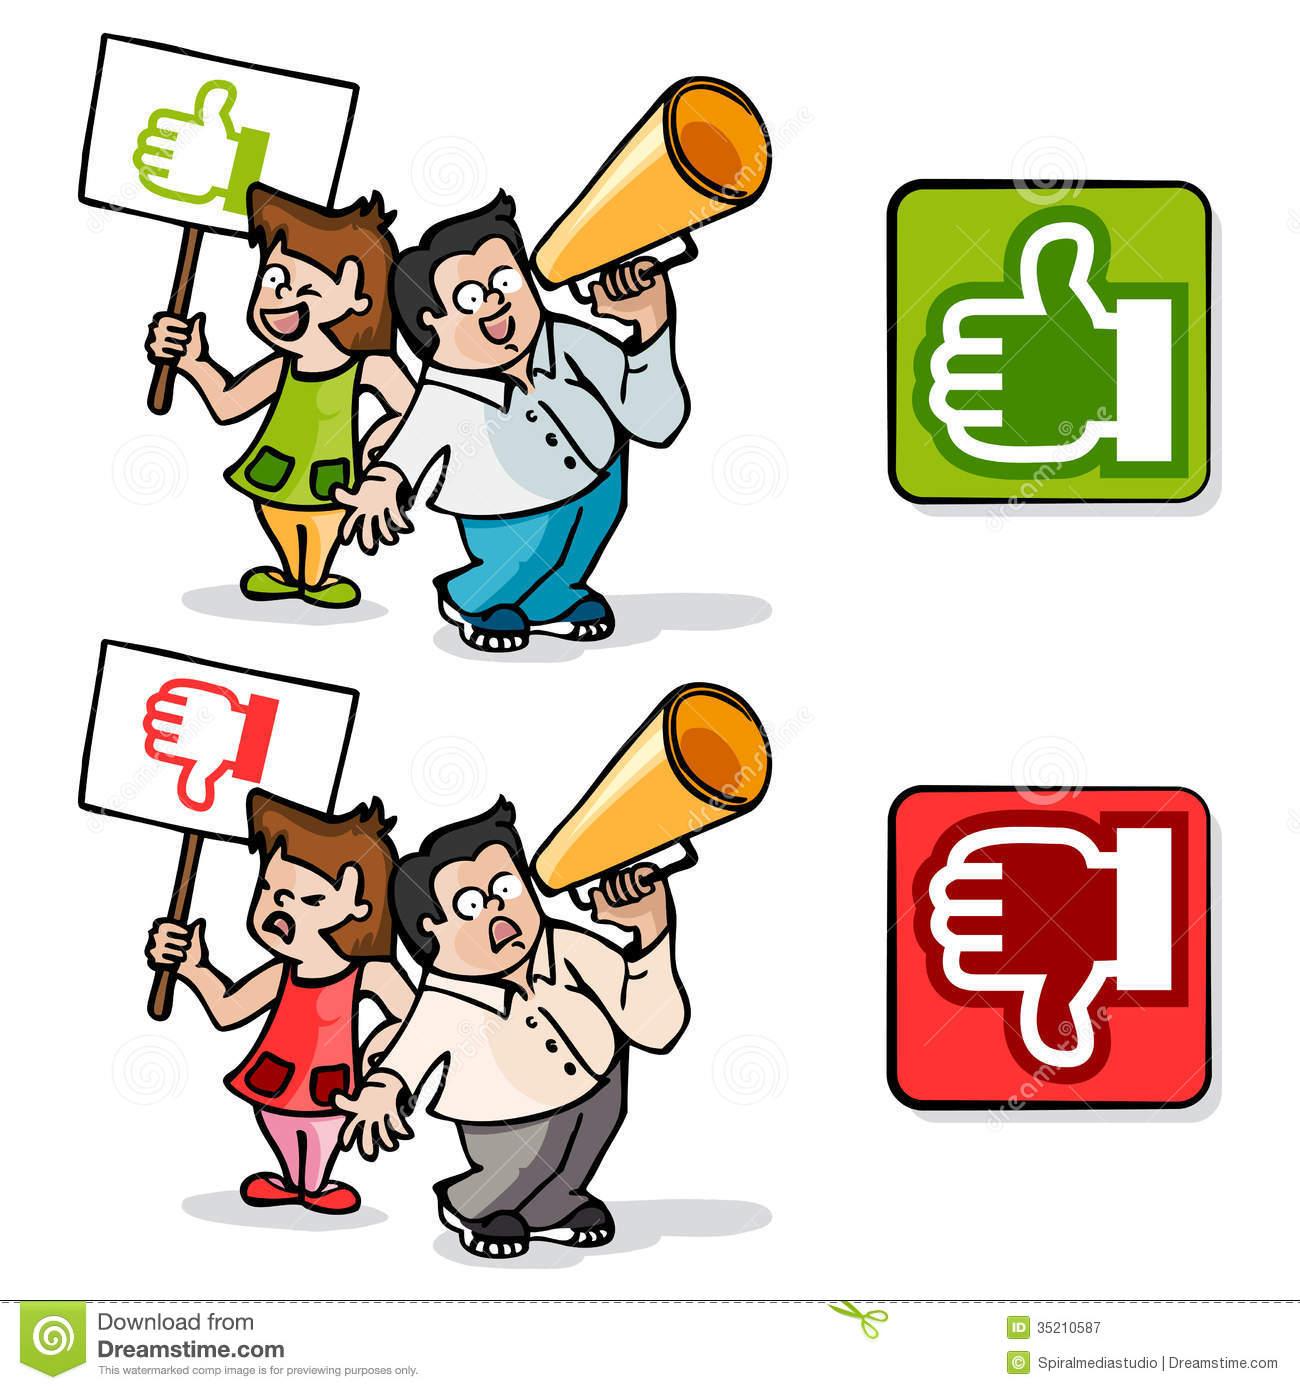 Disagreeing clipart svg free GBU: Agreement and Disagreement svg free